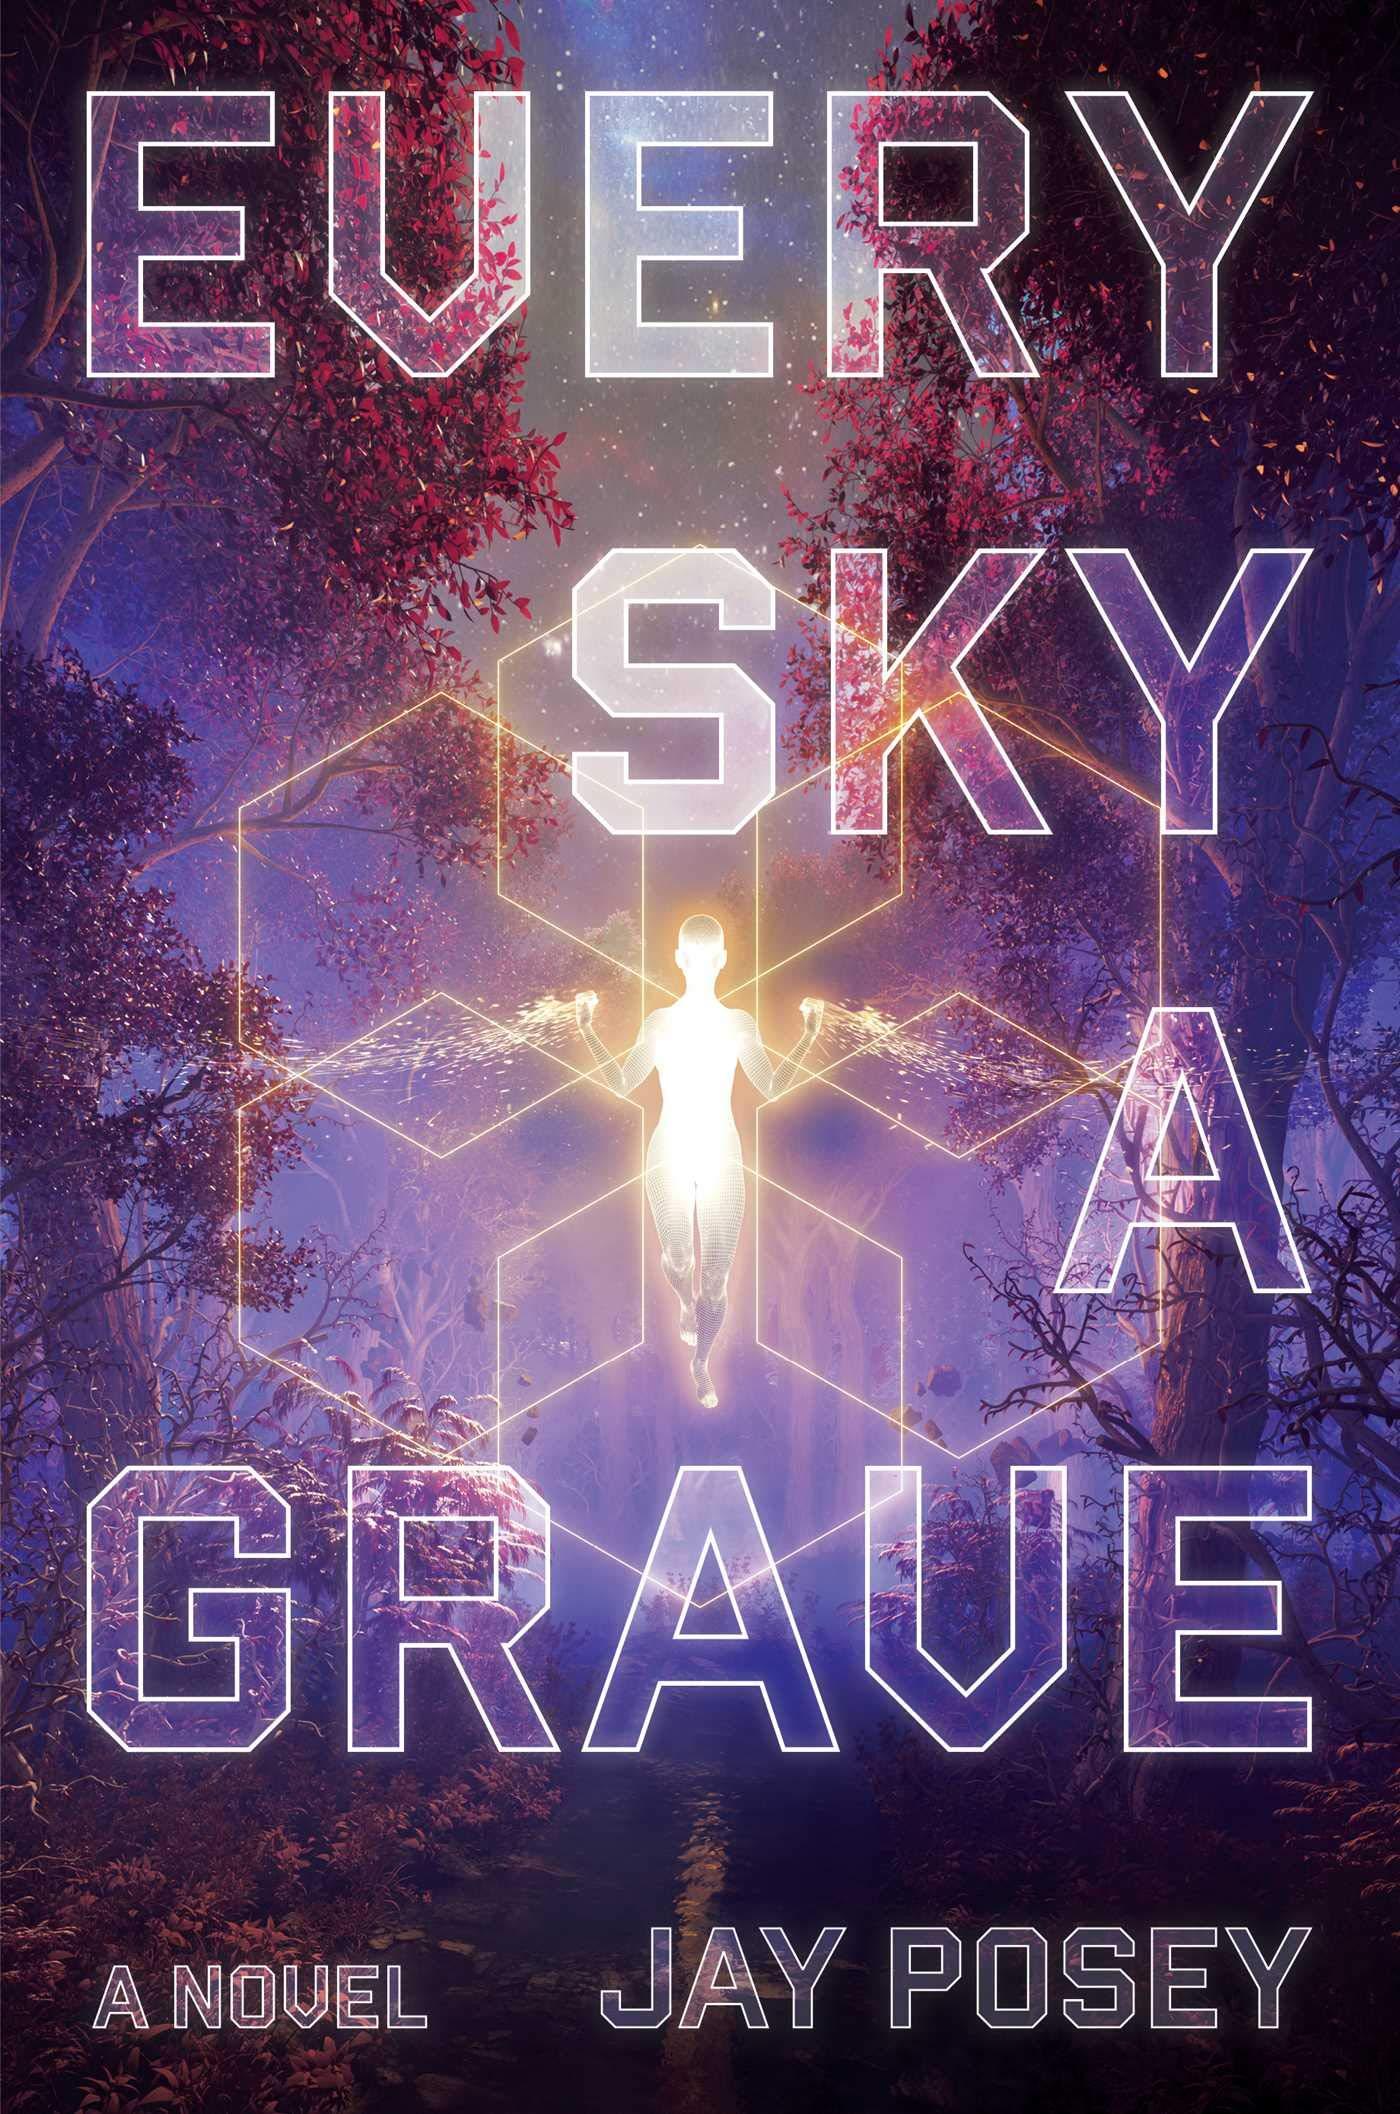 Amazon.com: Every Sky a Grave: A Novel (1) (The Ascendance Series):  9781982107758: Posey, Jay: Books